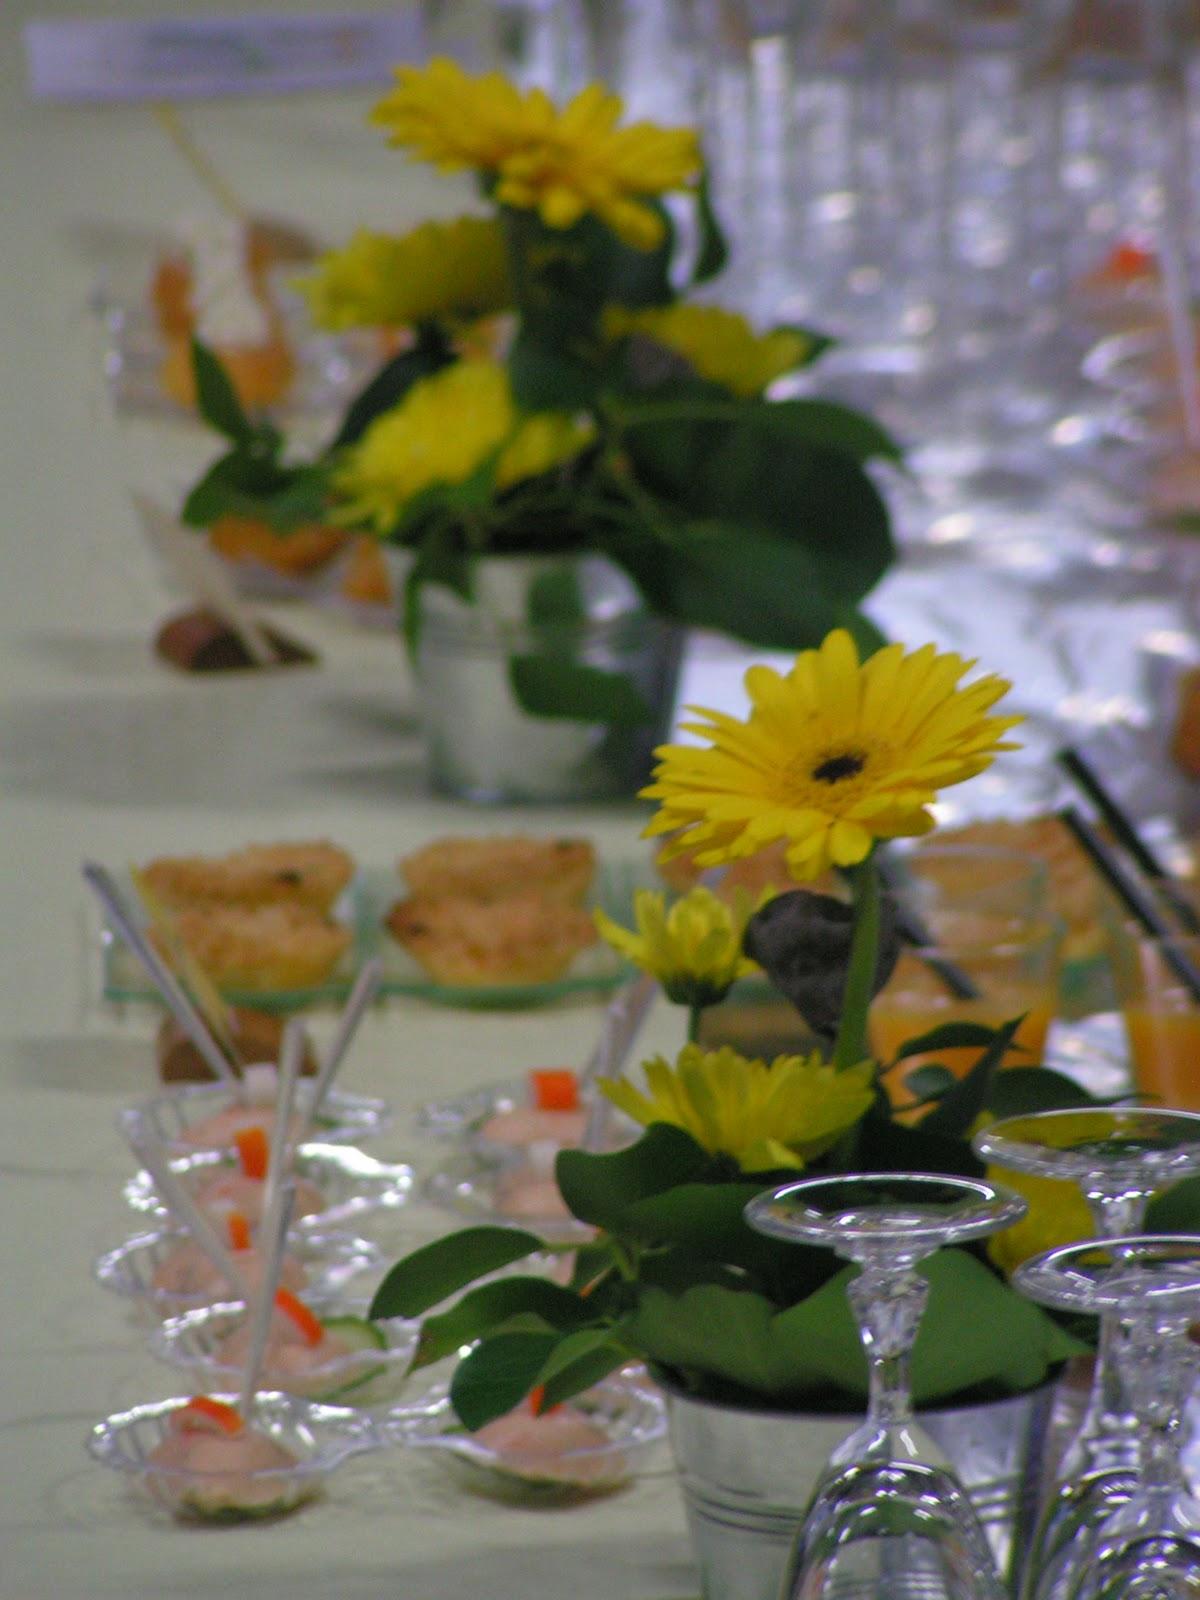 Cuisine couleurs saveurs 15 nov 2010 - Garage renault chantonnay ...